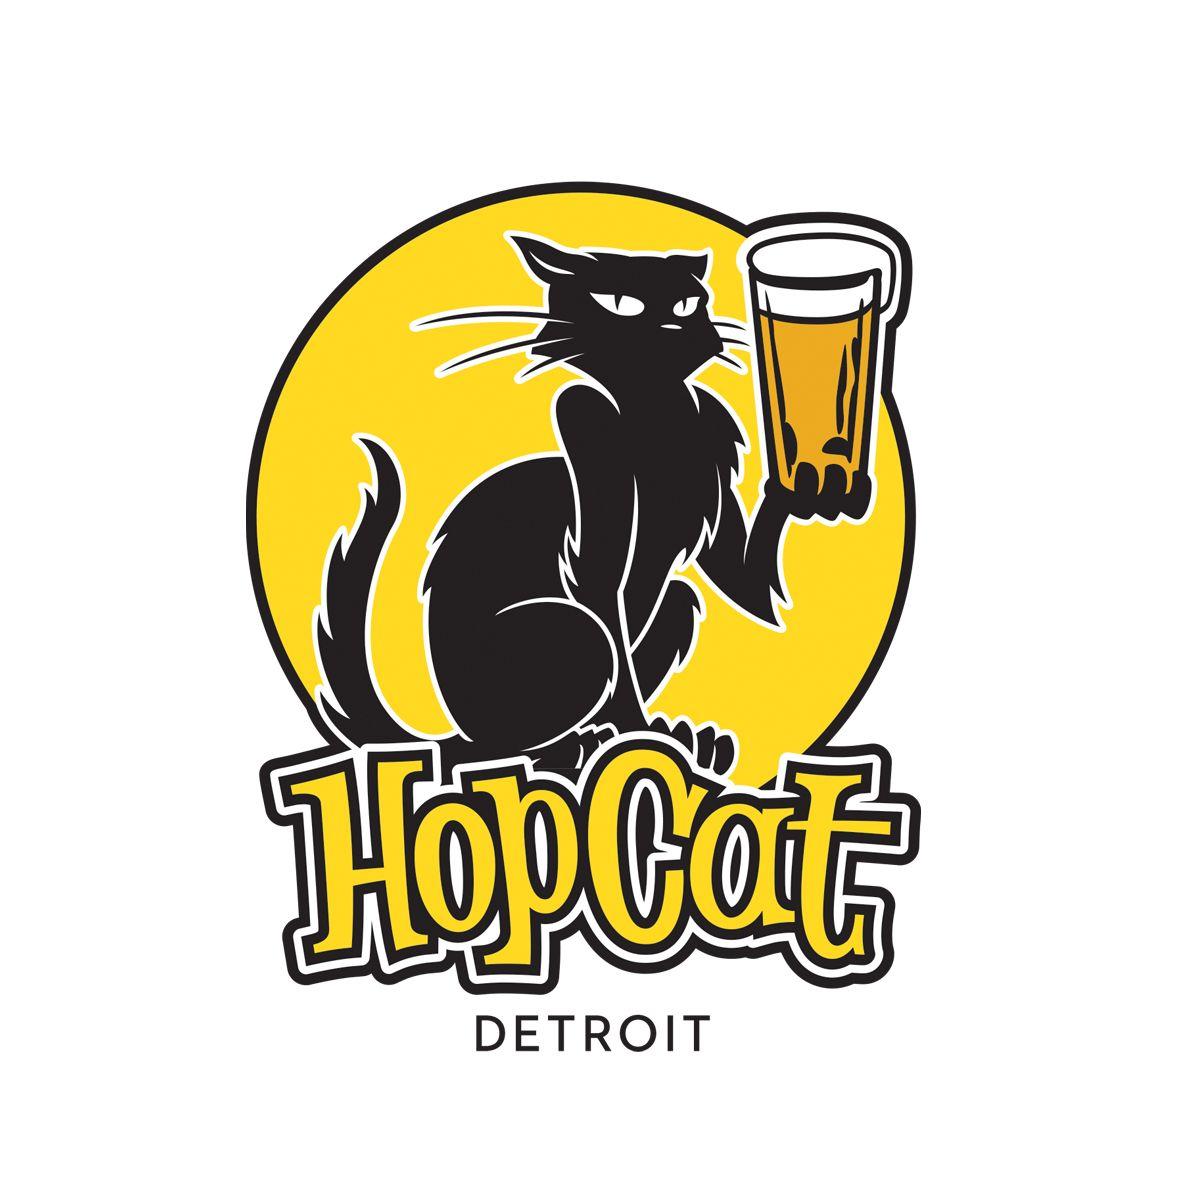 hopcat-logo